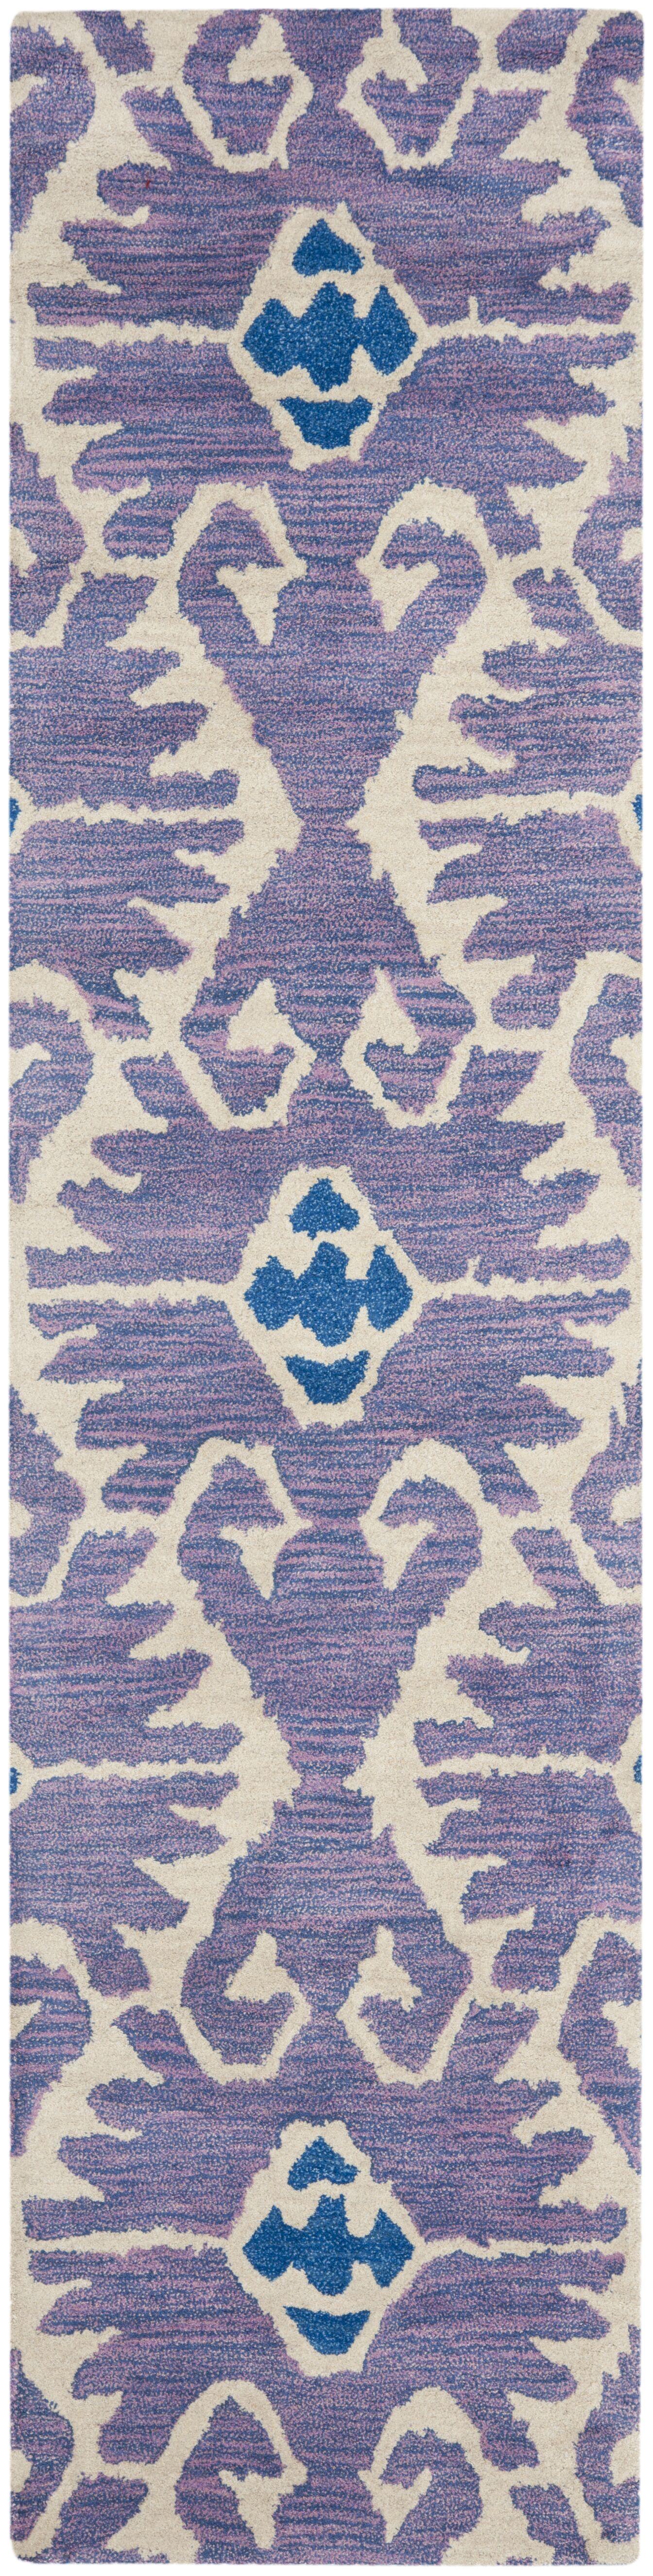 Kouerga Hand-Tufted Wool Lavender/Ivory Area Rug Rug Size: Runner 2'3